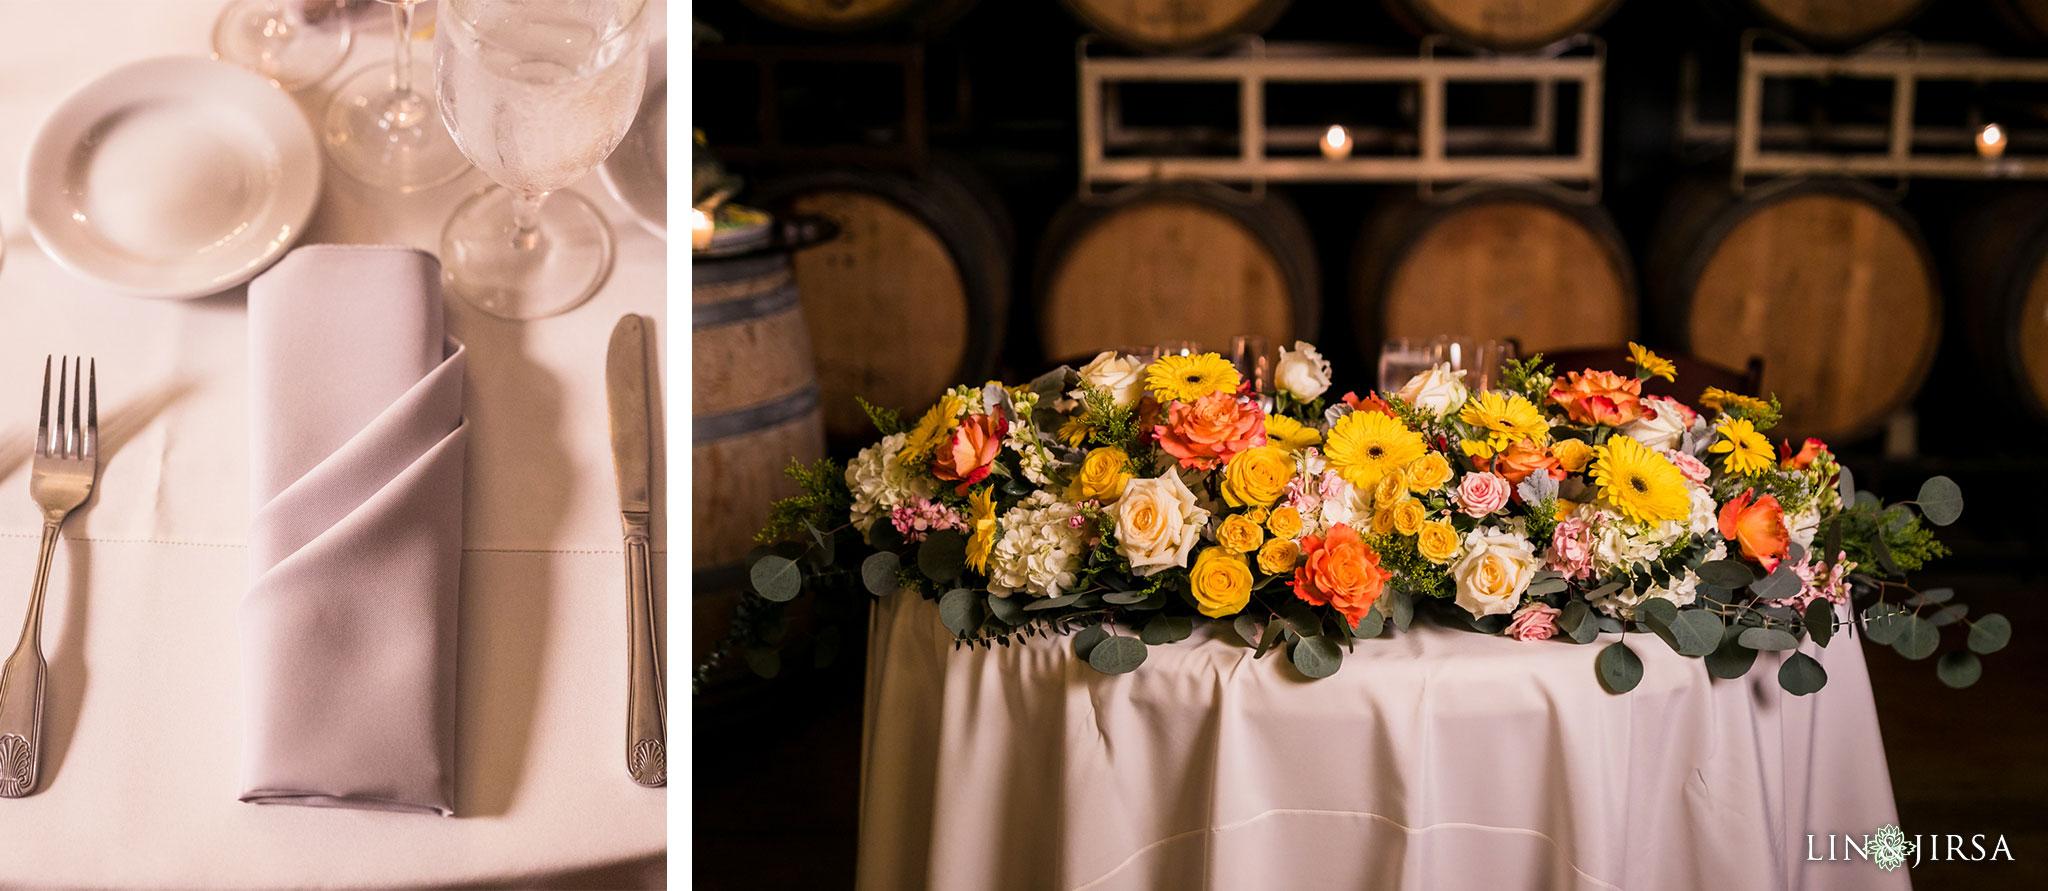 30 leoness cellars temecula wedding reception photography